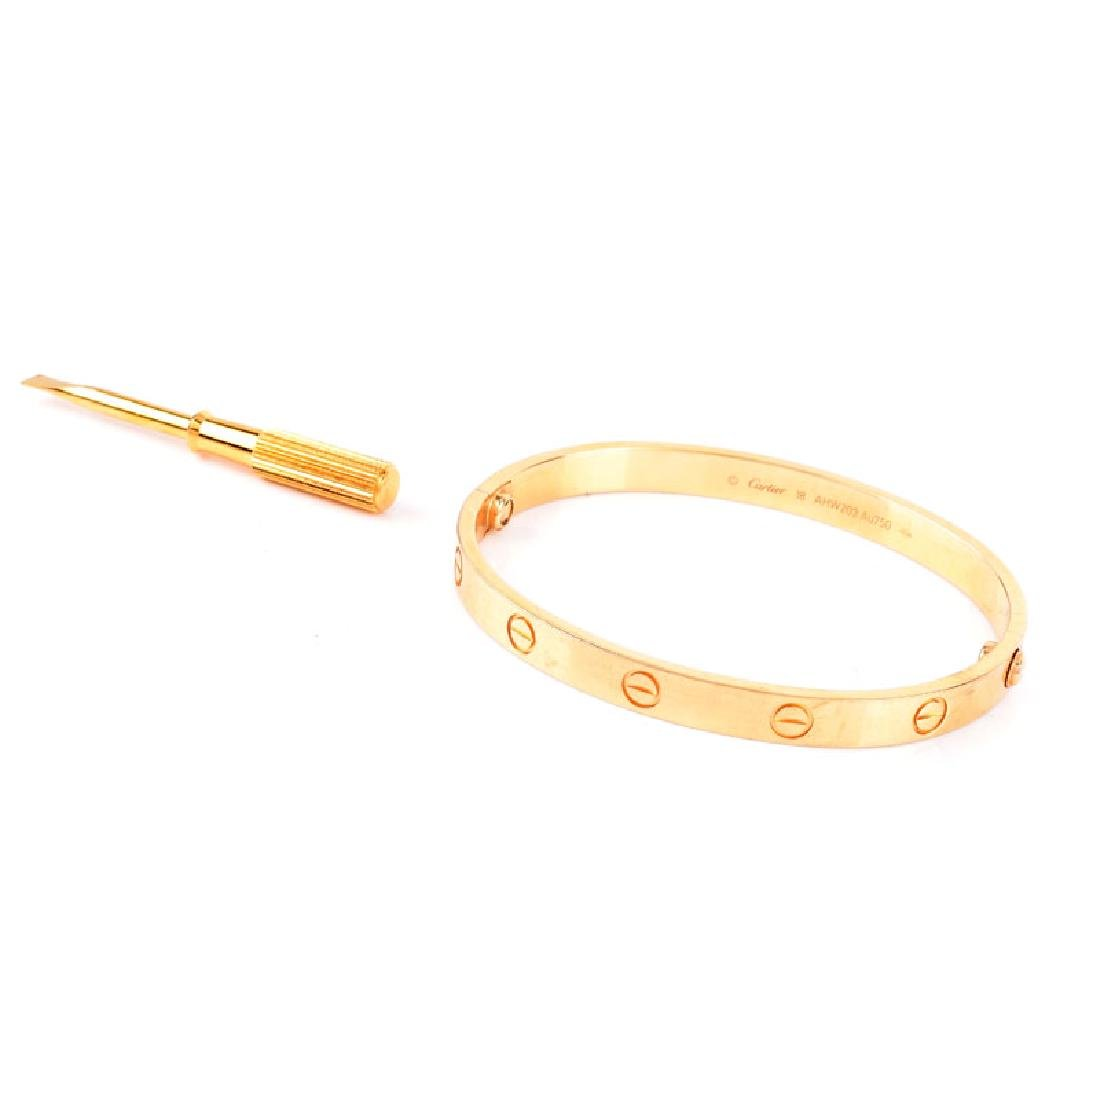 Circa 2014 Cartier 18 Karat Yellow Gold Love Bracelet - 3